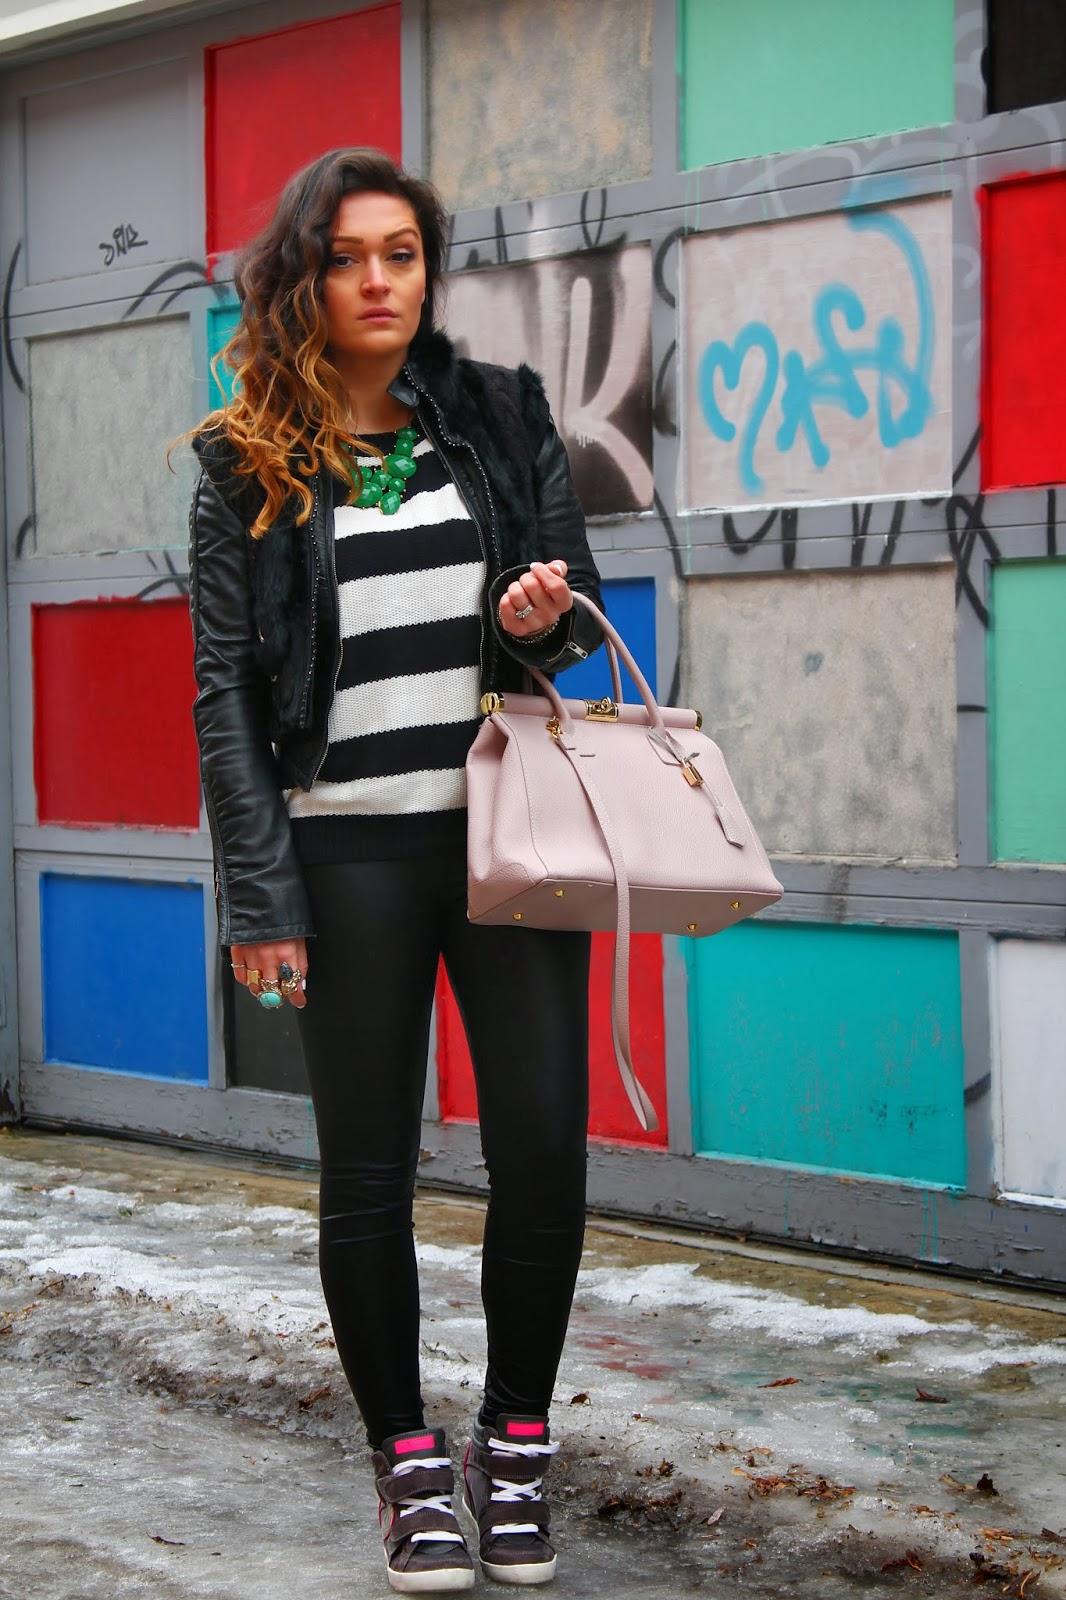 #aldo #aldoboots #overthekneeboots #boots #suedeboots #overtheknee #leather #party #holiday #fashion #streetstyle #toronto #canada #fashionblogger #canadianfashionblogger #serbianfashionblogger #outfit #ootd #trend #hotblogger #bestblogger #topblogger #topfashionblogger #fur #leather #torontostreetstyle #torontofashion #torontoblogger #topcanadianblogger #canadianfashion #srpksablogerka #srpskeblogerke #moda #stil #srkpskamoda #topblogger #bestblogger #bestcanadianblogger #ukblogger #ukbloggers #bestukbloggers #hm #h&M #sweater #hmsweater #h&msweater #zara #zarajacket #beanie #beanieoutfit #printjacket #danierleather #louisvuitton #louisvuittonspeedy #speedy #monogramspeedy #leatherbag #leathersatchel #philiplim #ottawa #Ontario #ontarioblogger #urbanbehavior #urbanplanet #bestofstreetstyle #beststreetstyle #furcoat #stripes #stripedsweather #layering #layeringclothes #joefresh #canadiandesigner #forever21 #forever21sweater #fur #popofcolour #brightoutfit #cobaltblue #cobaltbluenecklace #royalblue #royalbluenecklace #statementnecklace #furcollar #furcollarcoat #chicisimo #chictopia #sashadollfashioncloset #sashadollfashion #sashadoll #michaelkors #michaelkorswatch #michaelkorsgoldwatch #laetherpants #leatherleggings #sneakers #guess #guesssneakers #emeraldnecklace #sportylook #sportskaelegancija #strippes #strippedsweater #urbanstyle #urnablook #lookbook #lookoftheday #outfitoftheday #cooloutfit #stackingrings #coolrings #statementring #statementrings